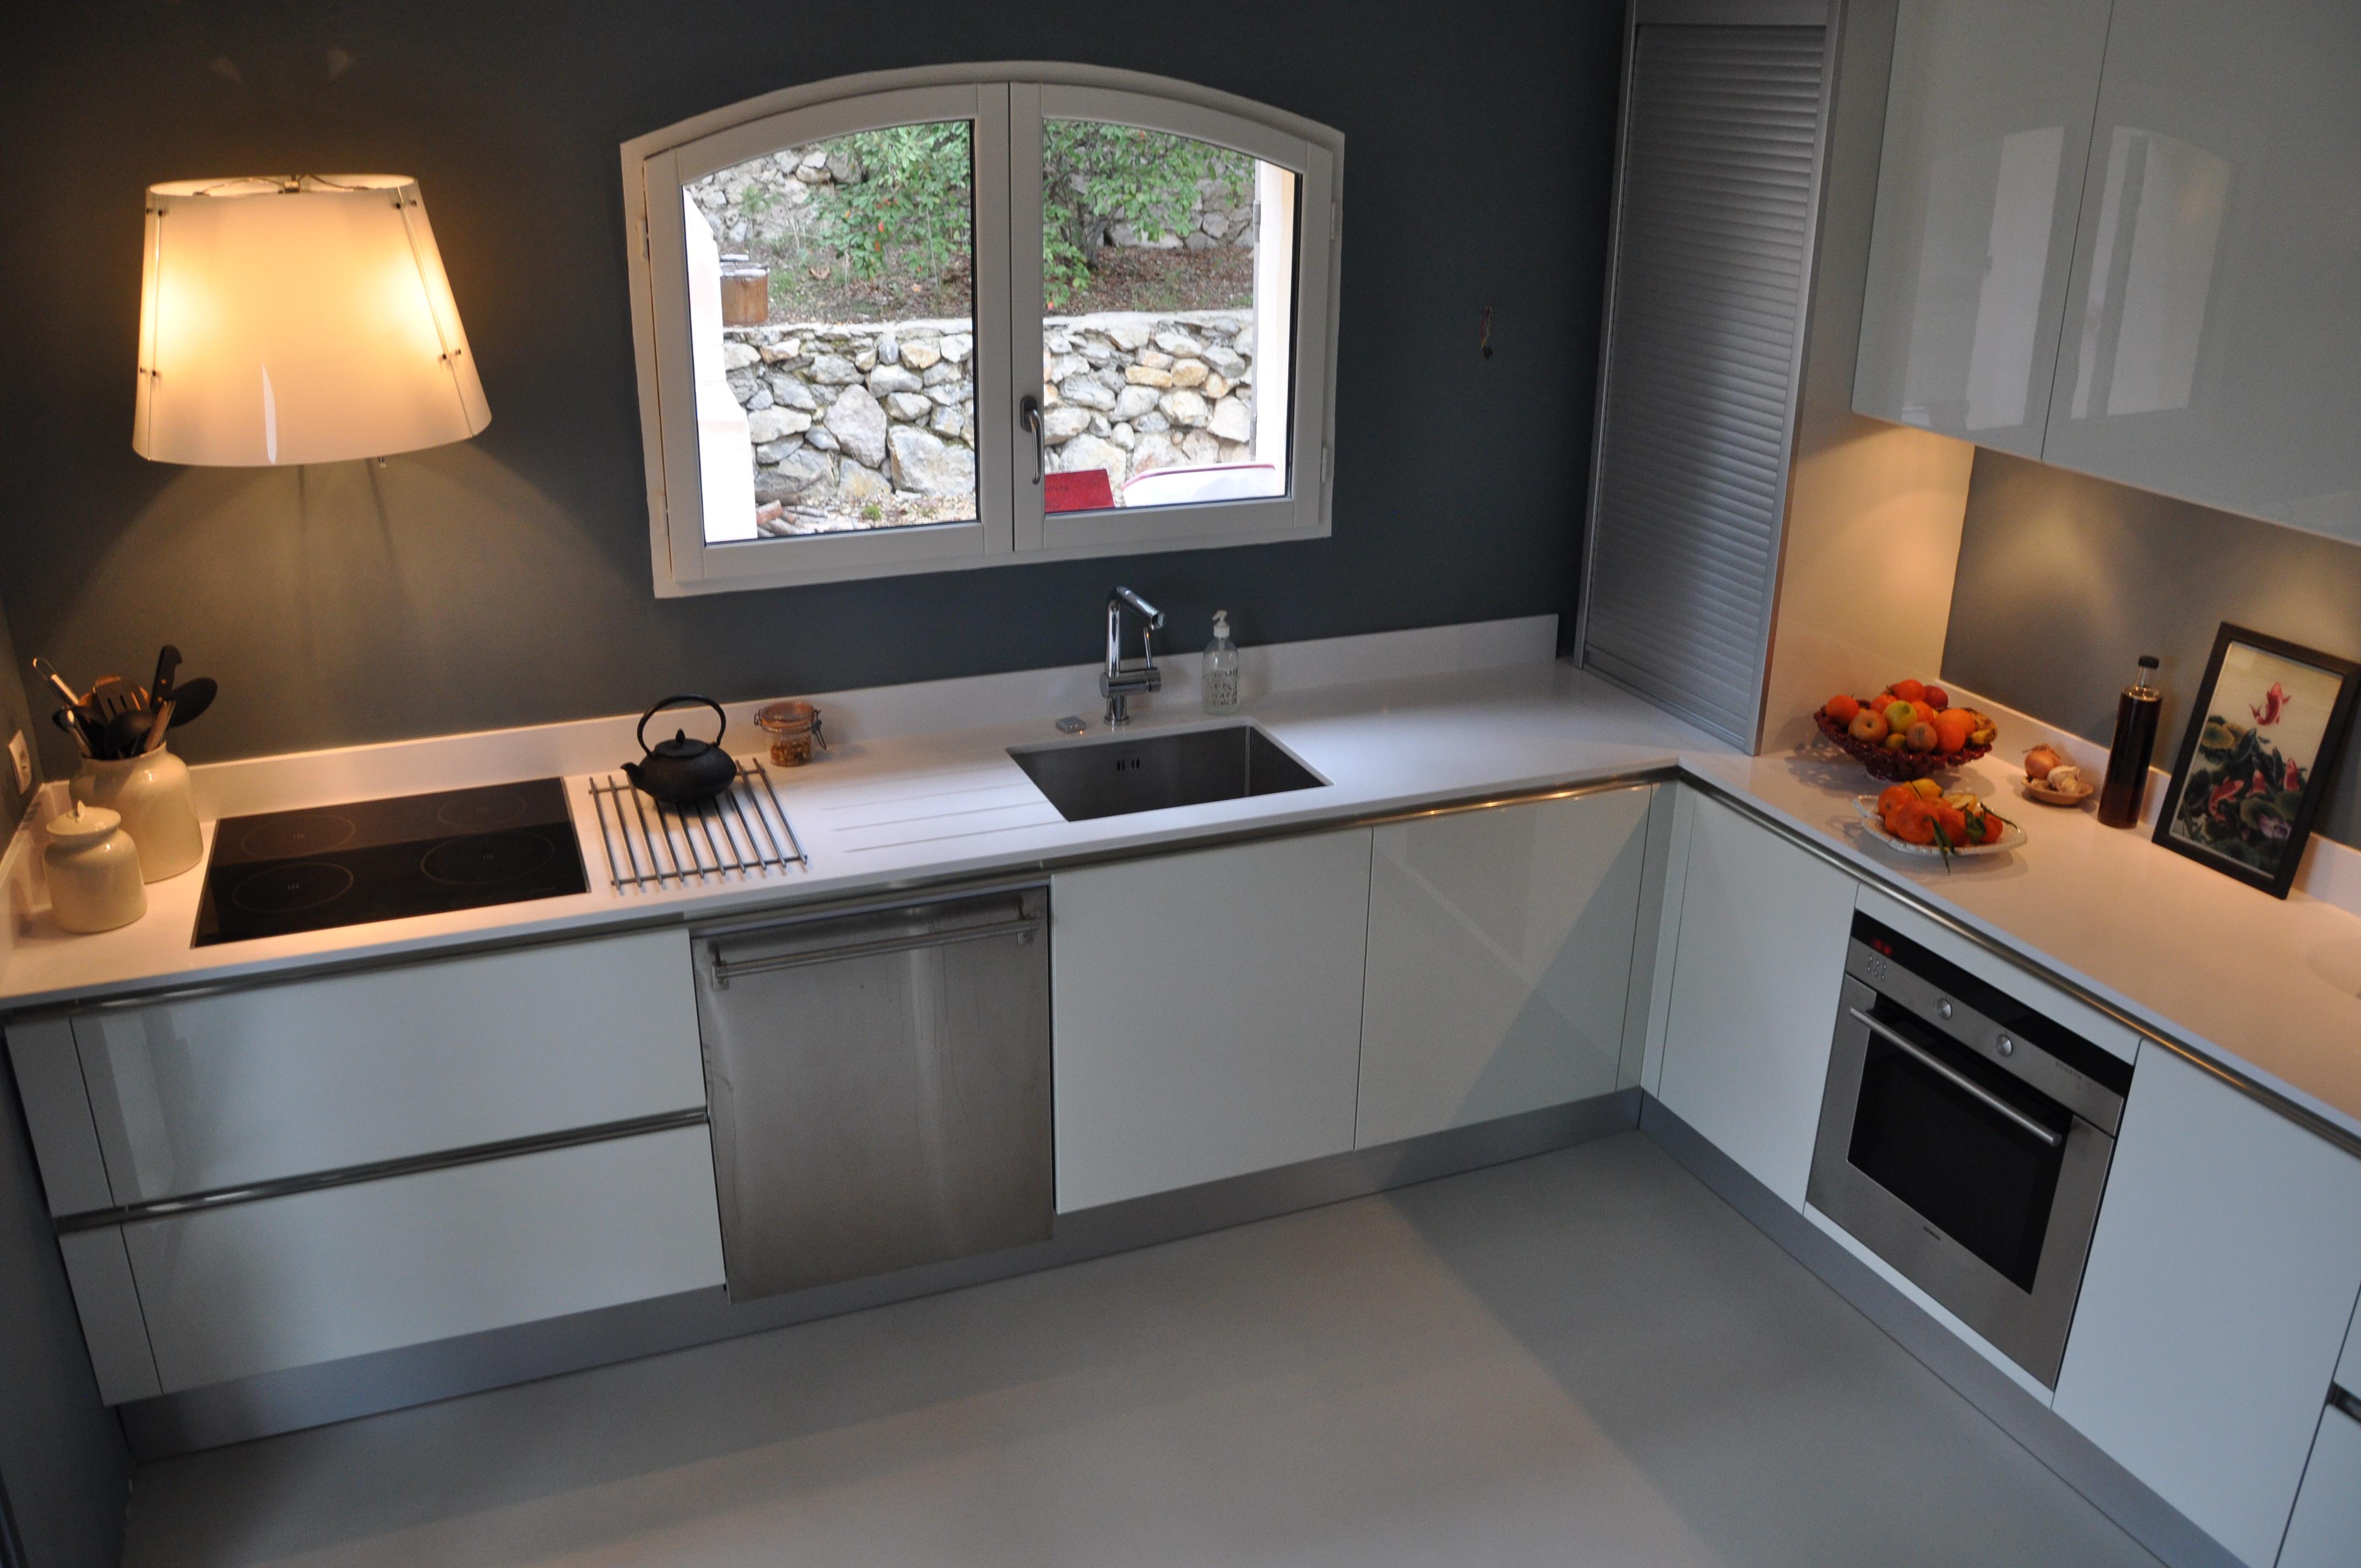 Beton Cire Küche | Beton Ciré! Willkommen bei Beton²